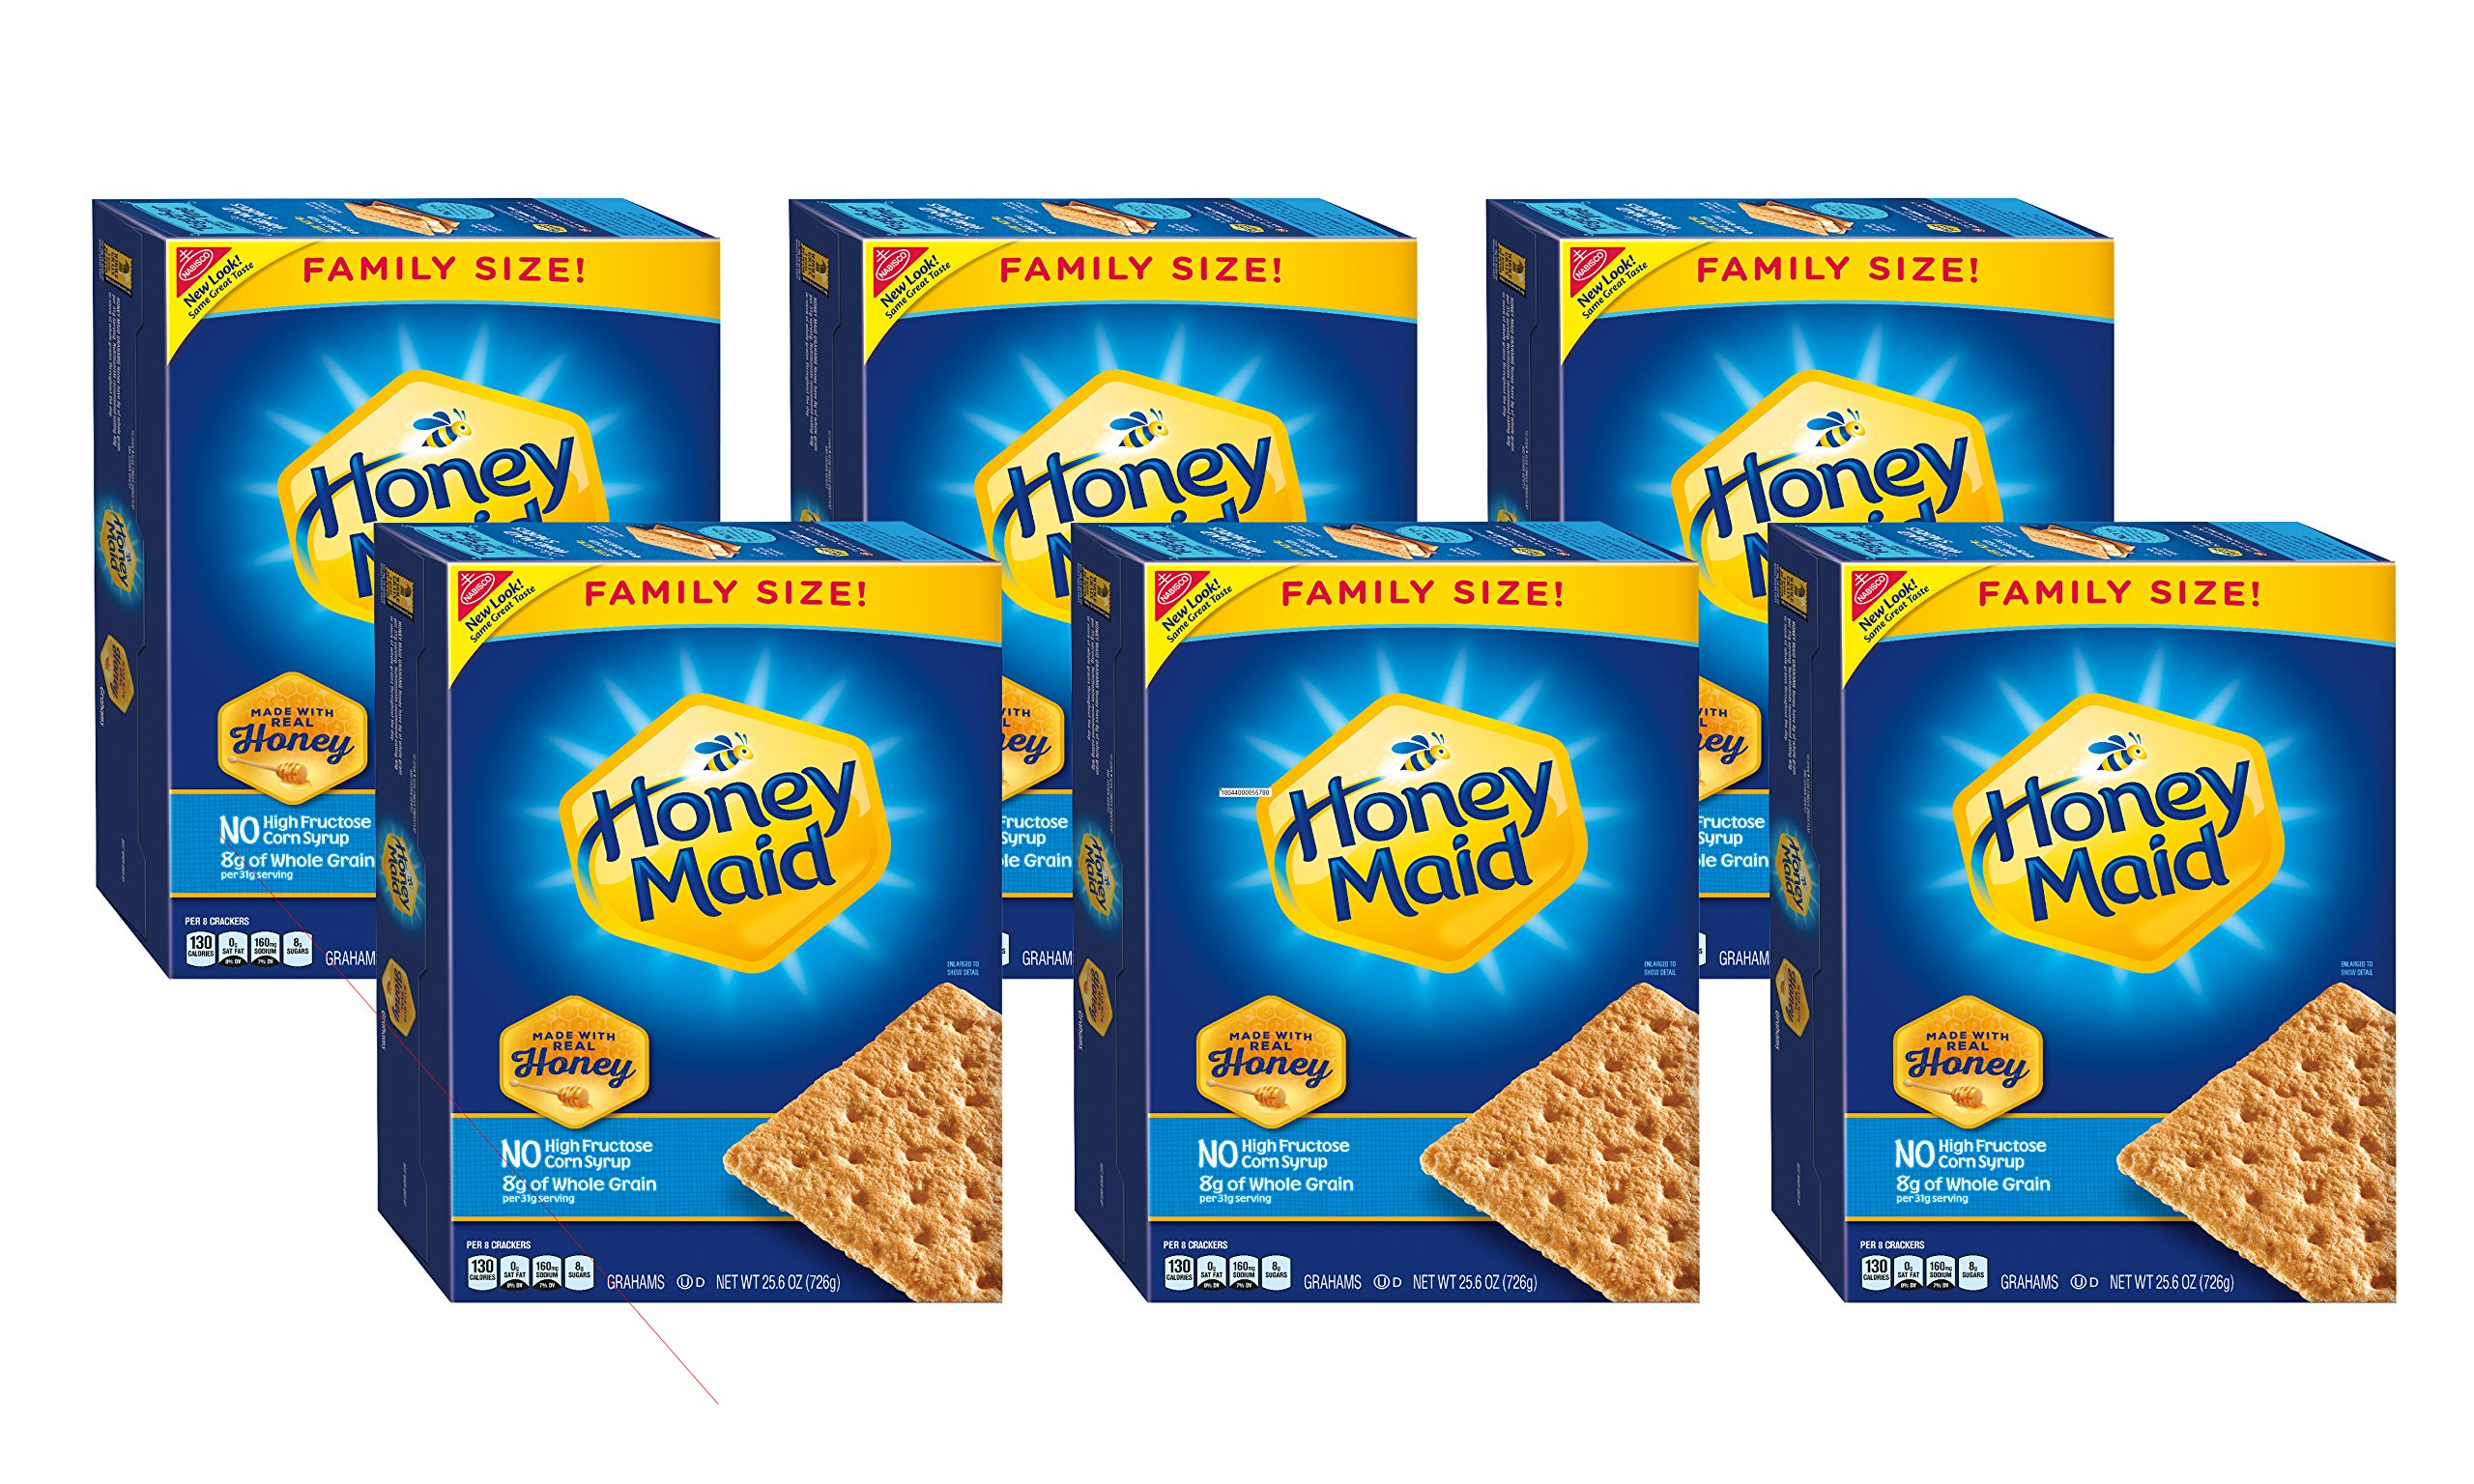 Honey Maid Honey Graham Crackers - Family Size, 25.6 Ounce (Pack of 6) by Honey Maid (Image #5)